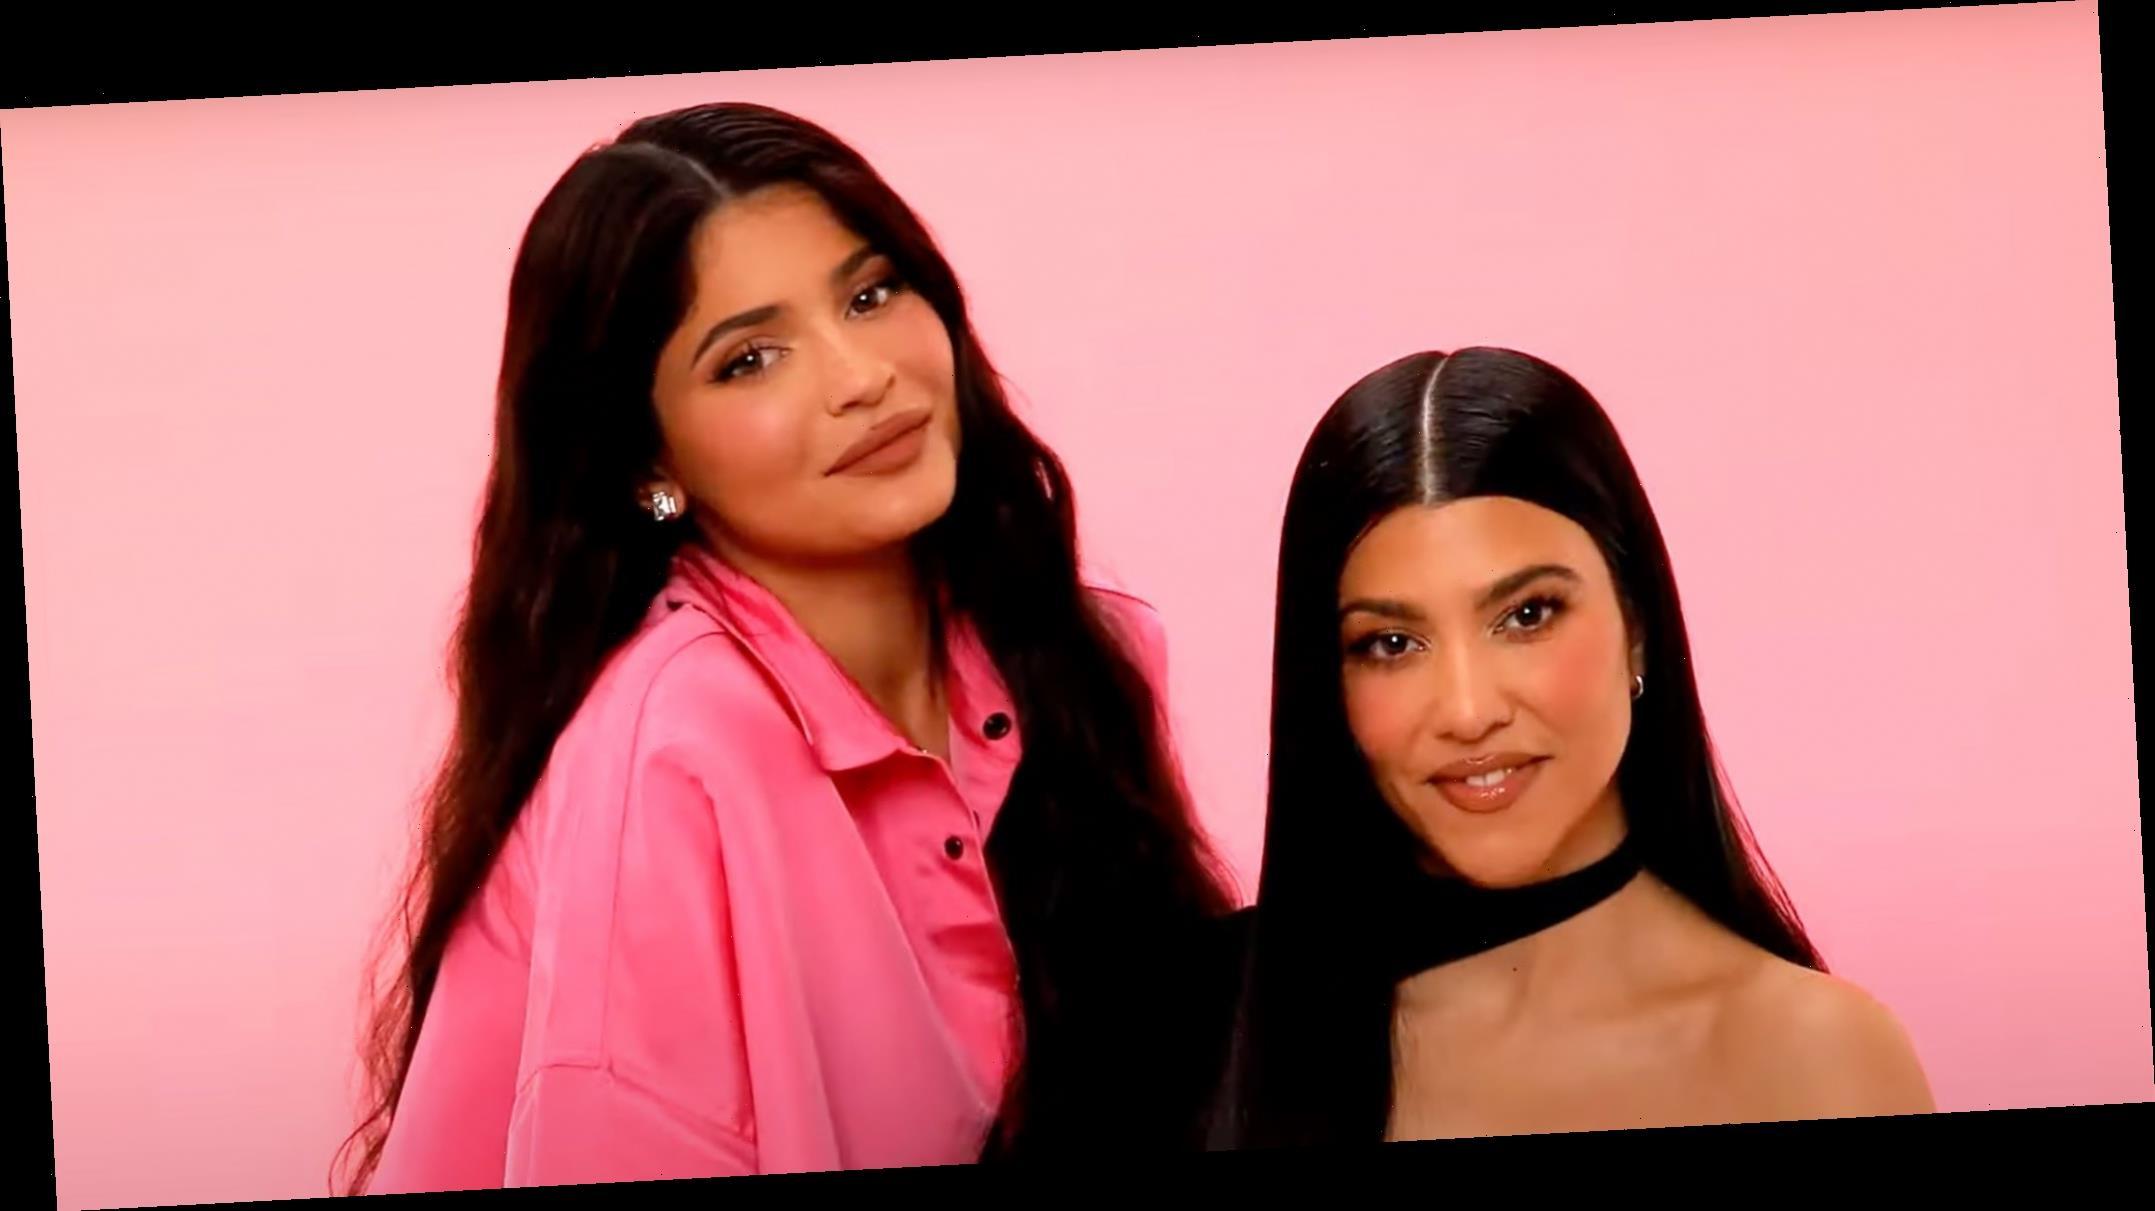 Watch Kylie Jenner Do Sister Kourtney's Makeup in New Video